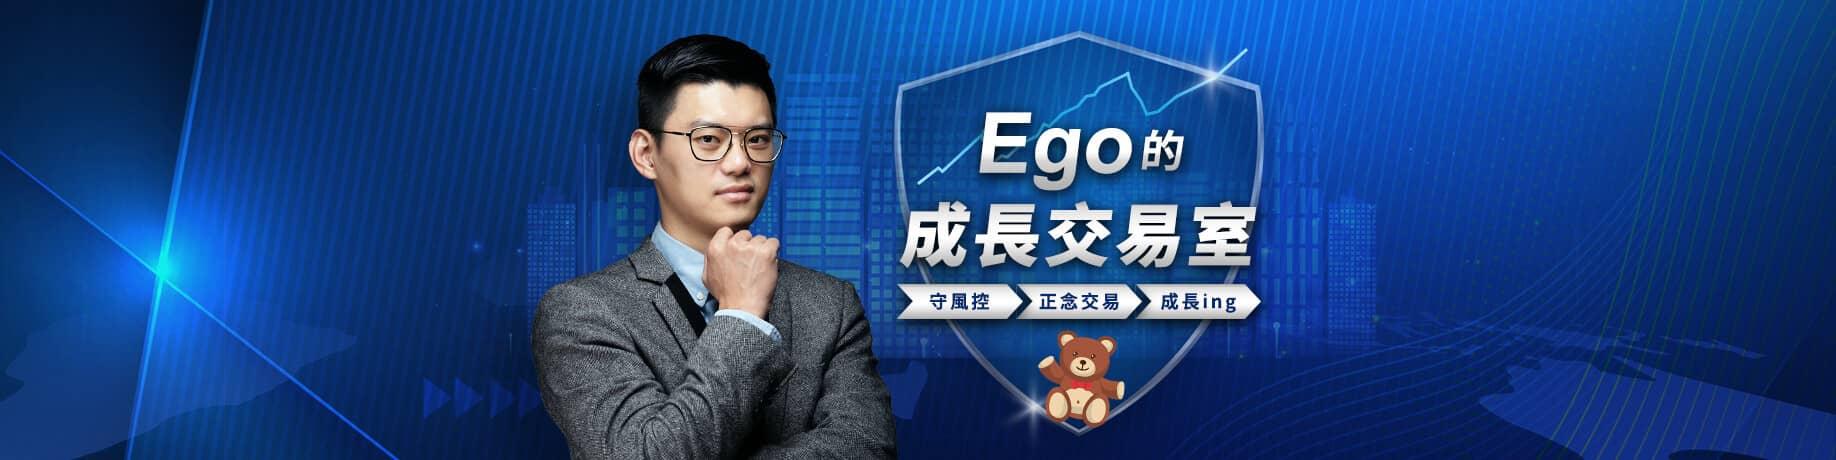 Ego 的成長交易室 | 守風控、正念交易、成長ing